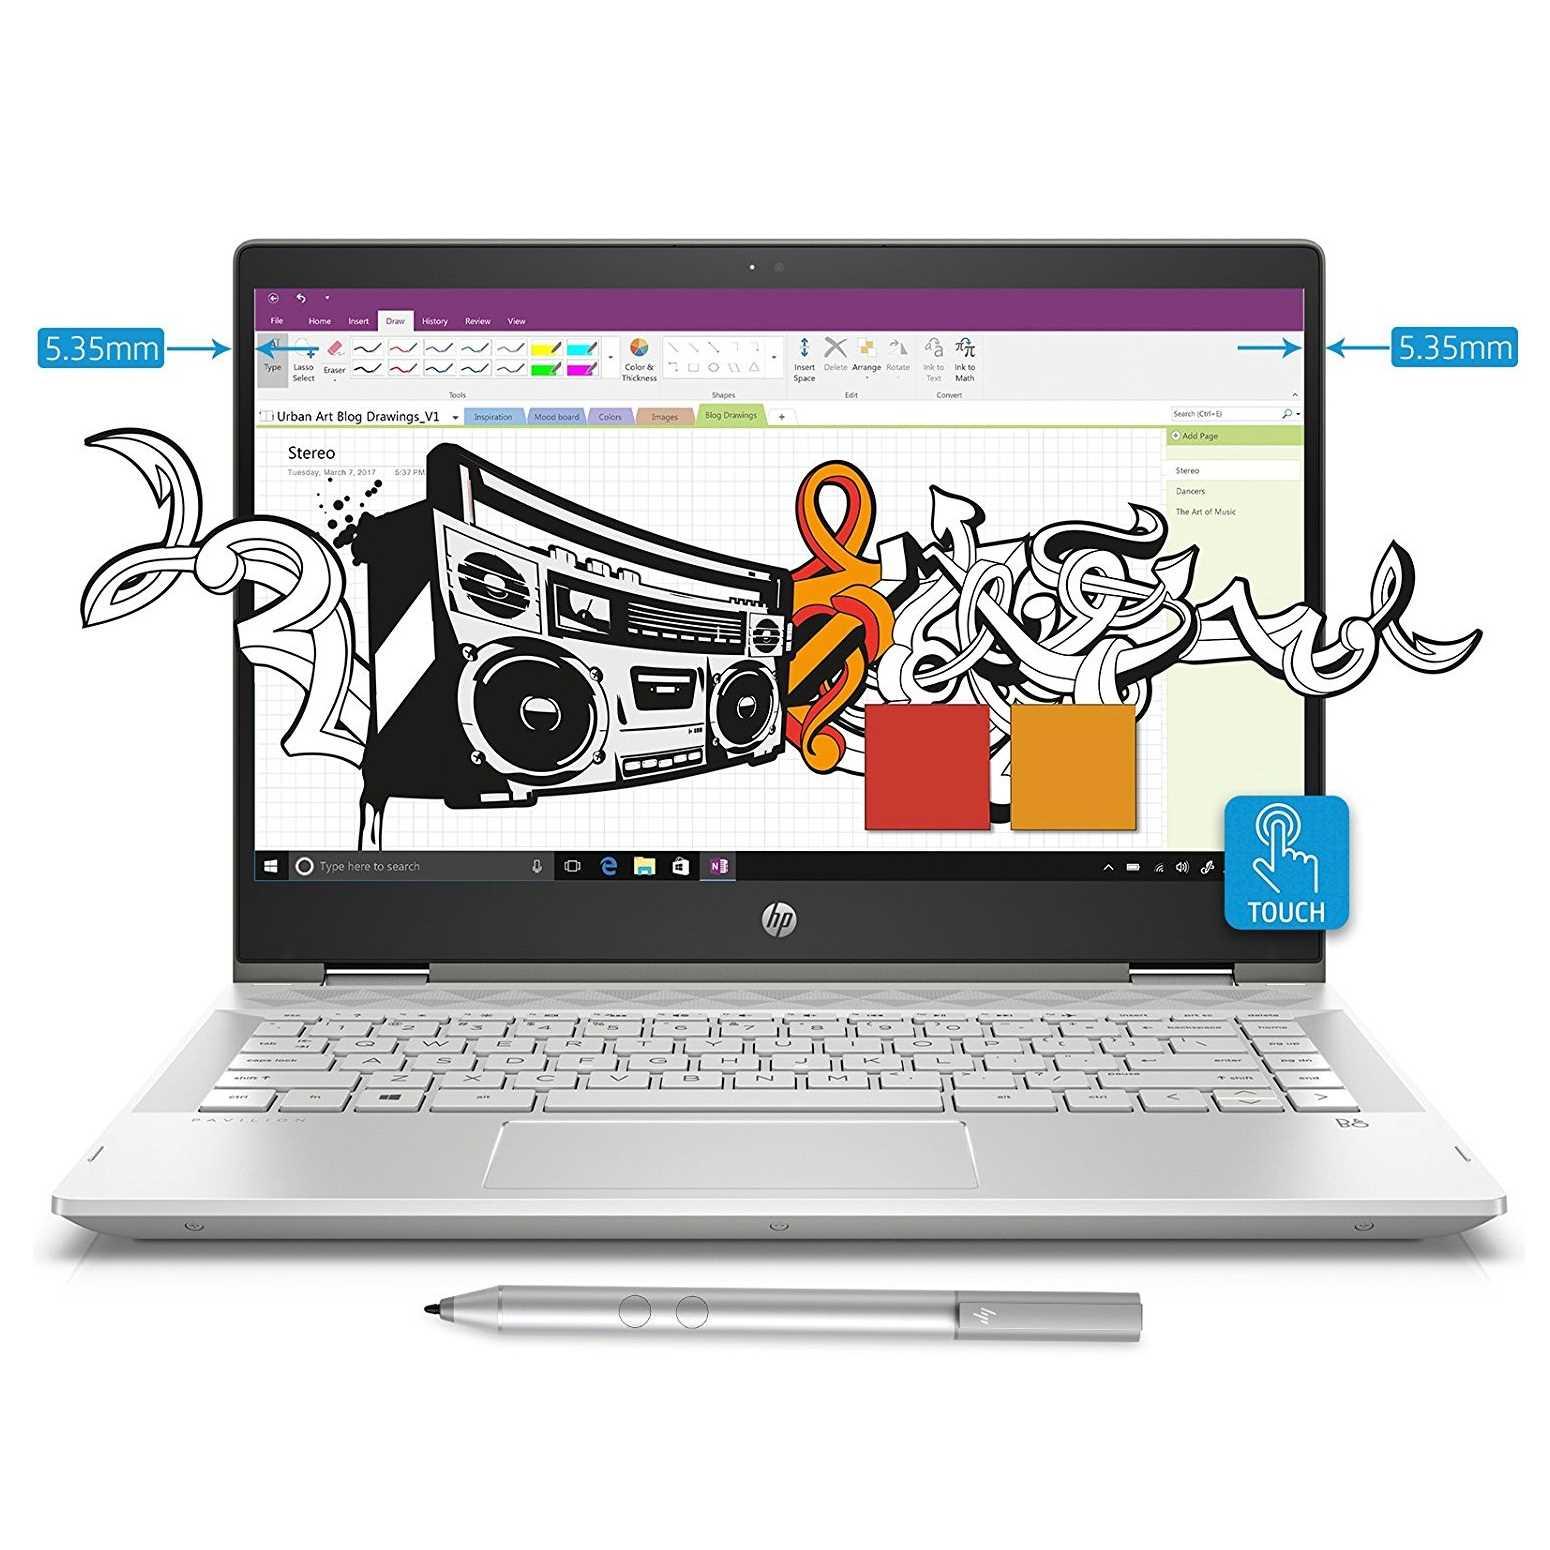 HP Pavilion 14 X360 CD0055TU Laptop